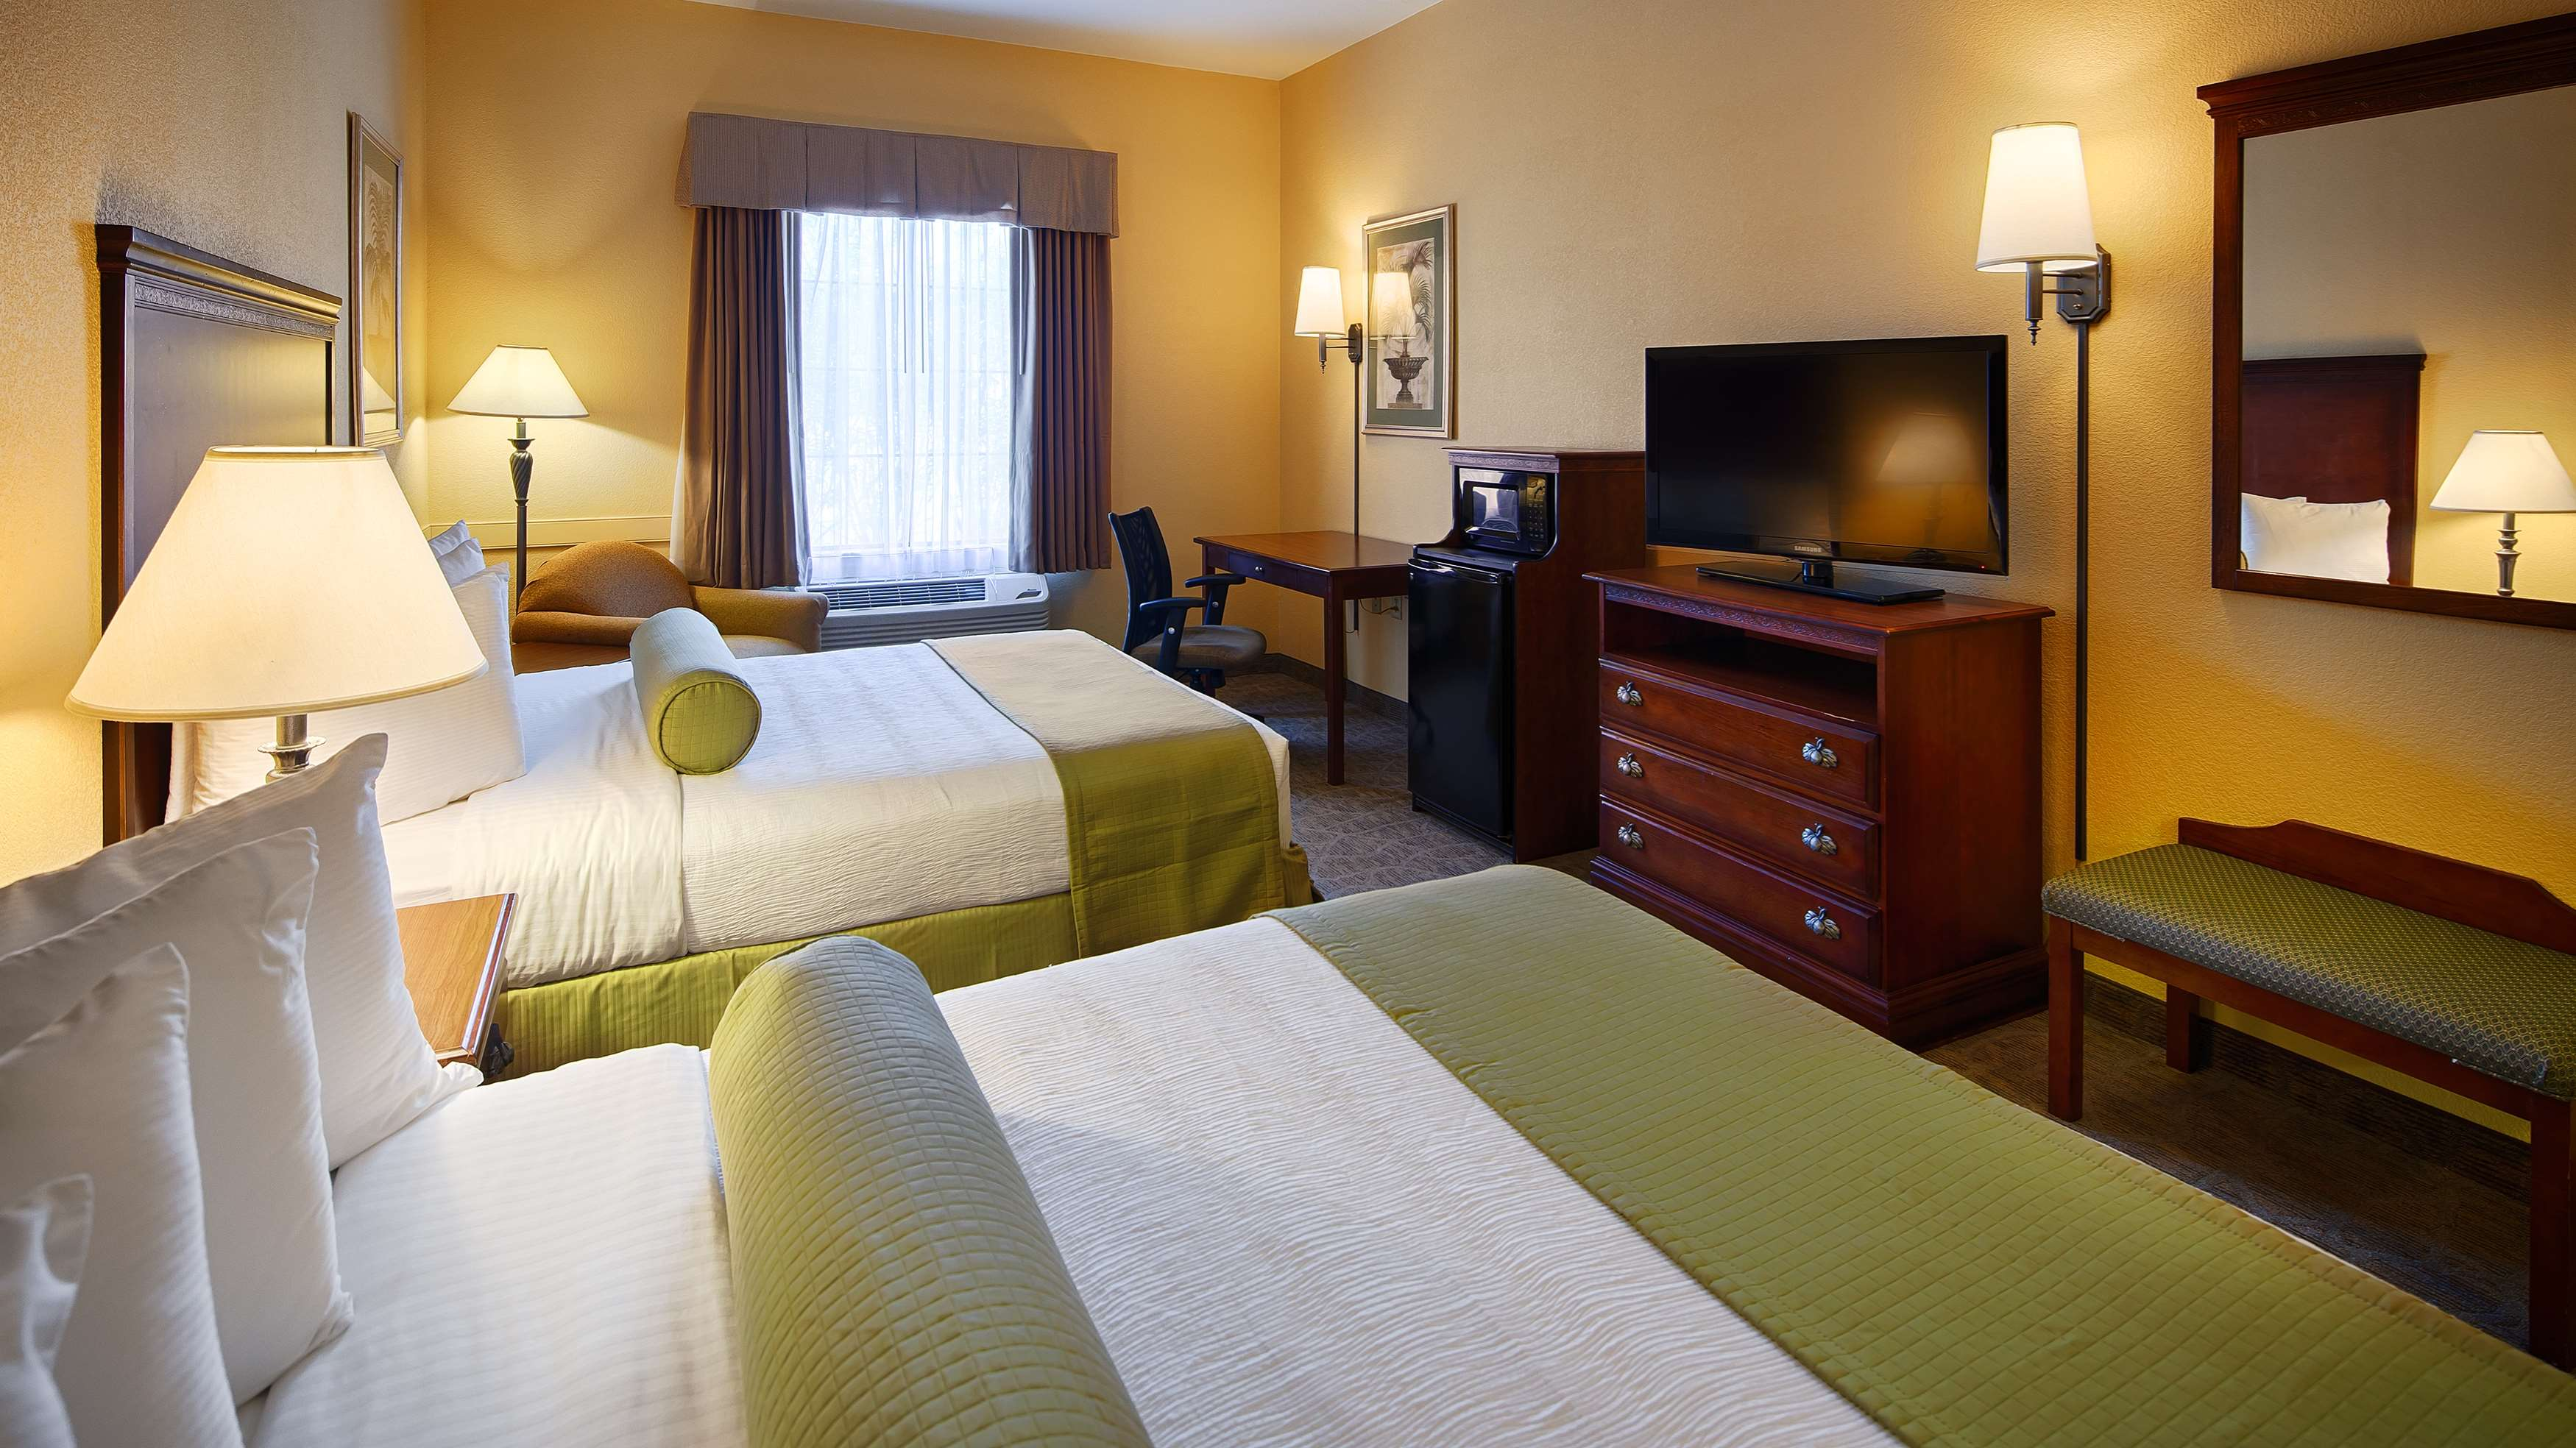 Best Western Plus Executive Hotel & Suites image 21